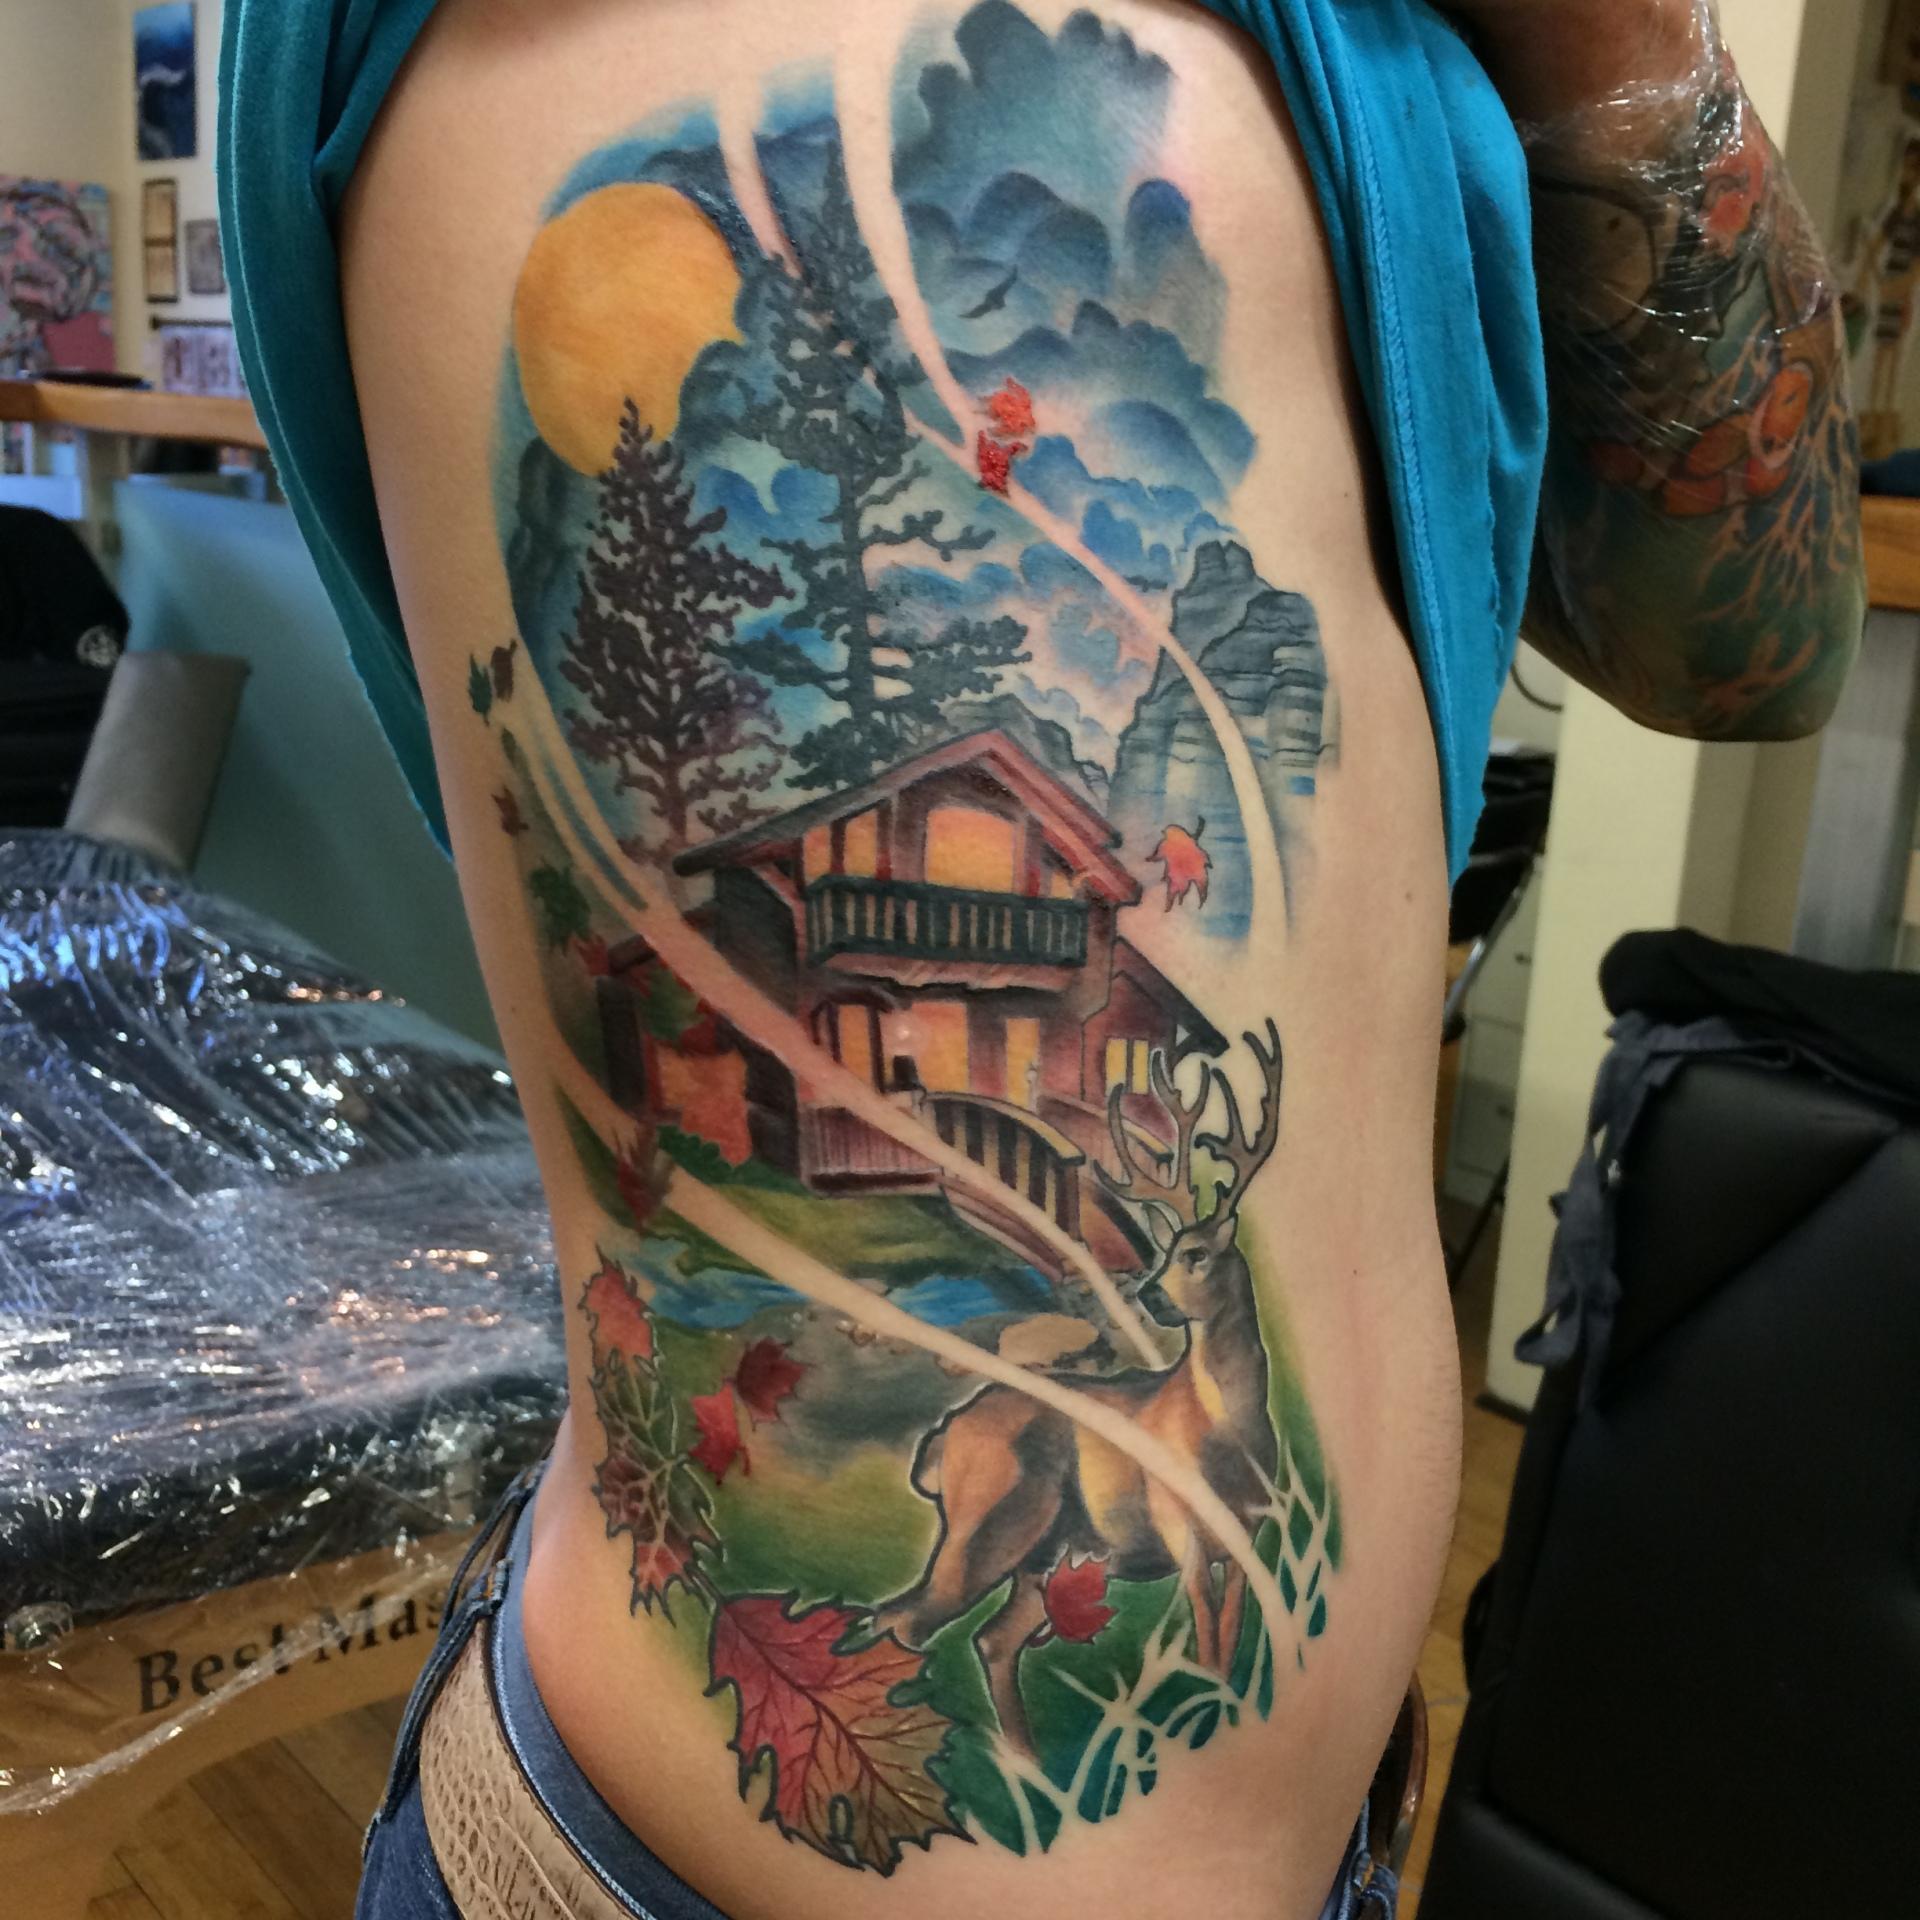 nature tattoo, Rose, roses, tattoo, art, realism rose, pretty, beautiful, floral, floral tattoo, orange county tattoo, nakota garza